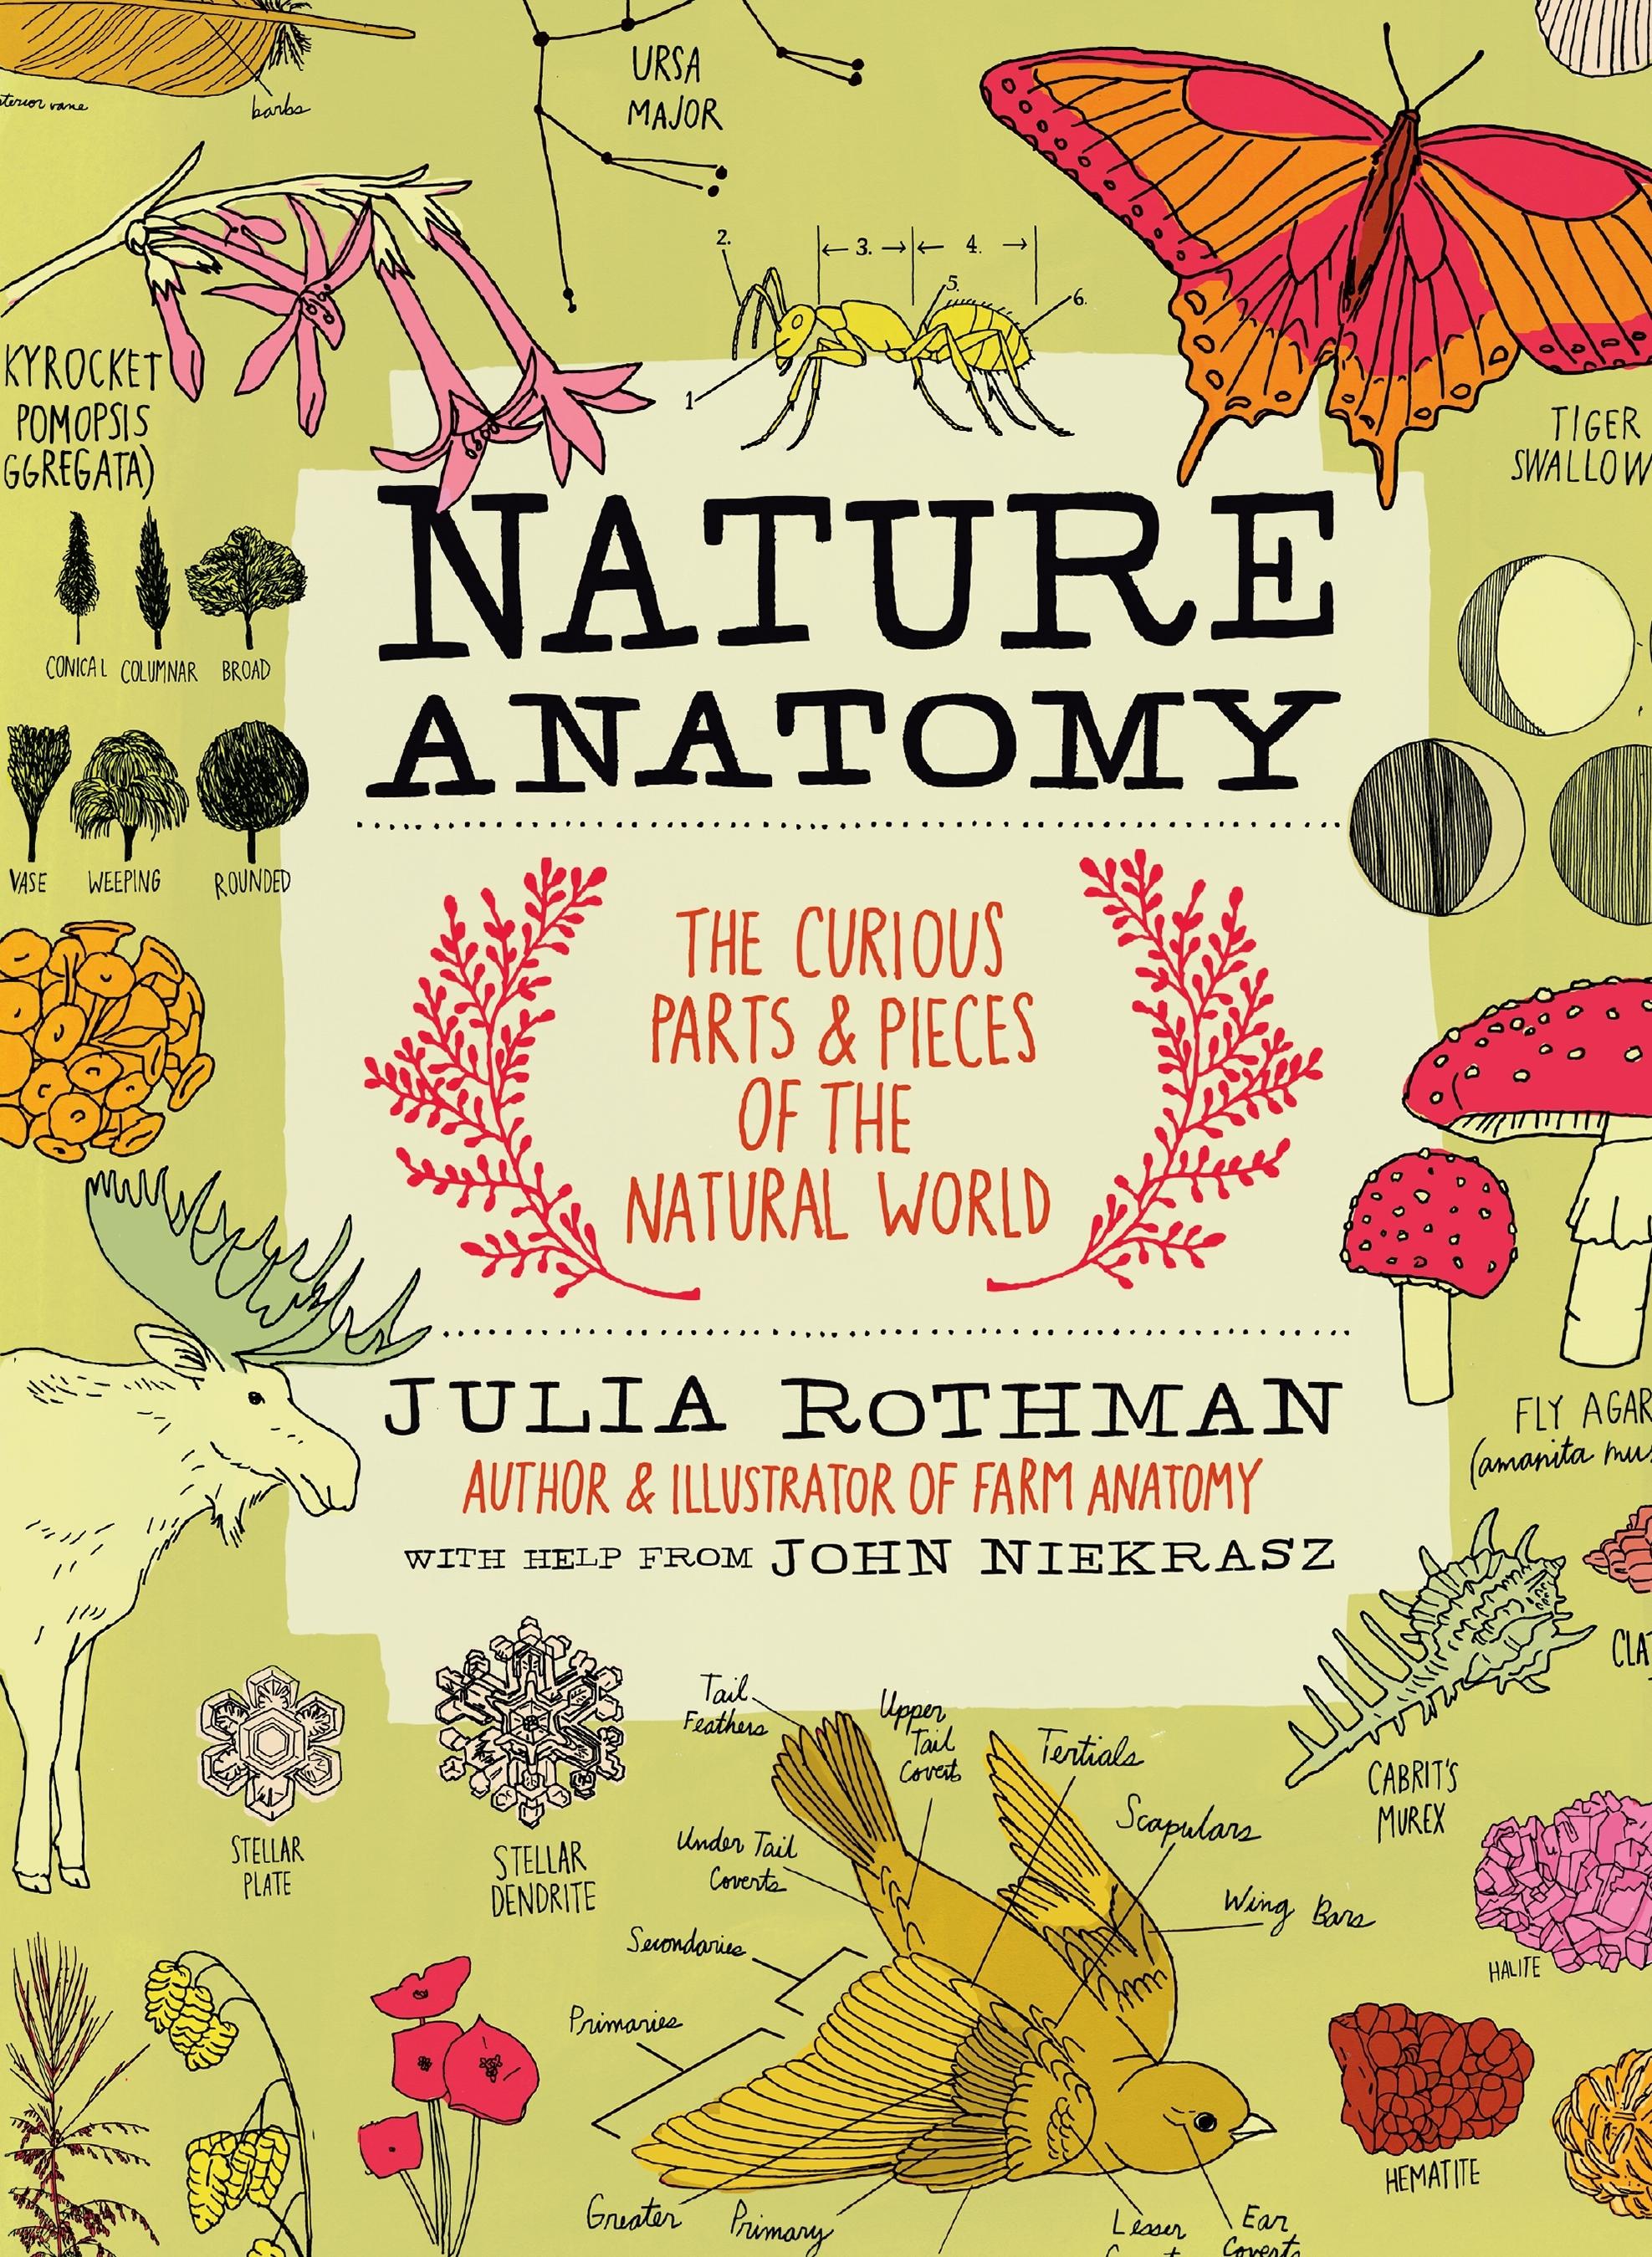 NatureAnatomy.jpeg